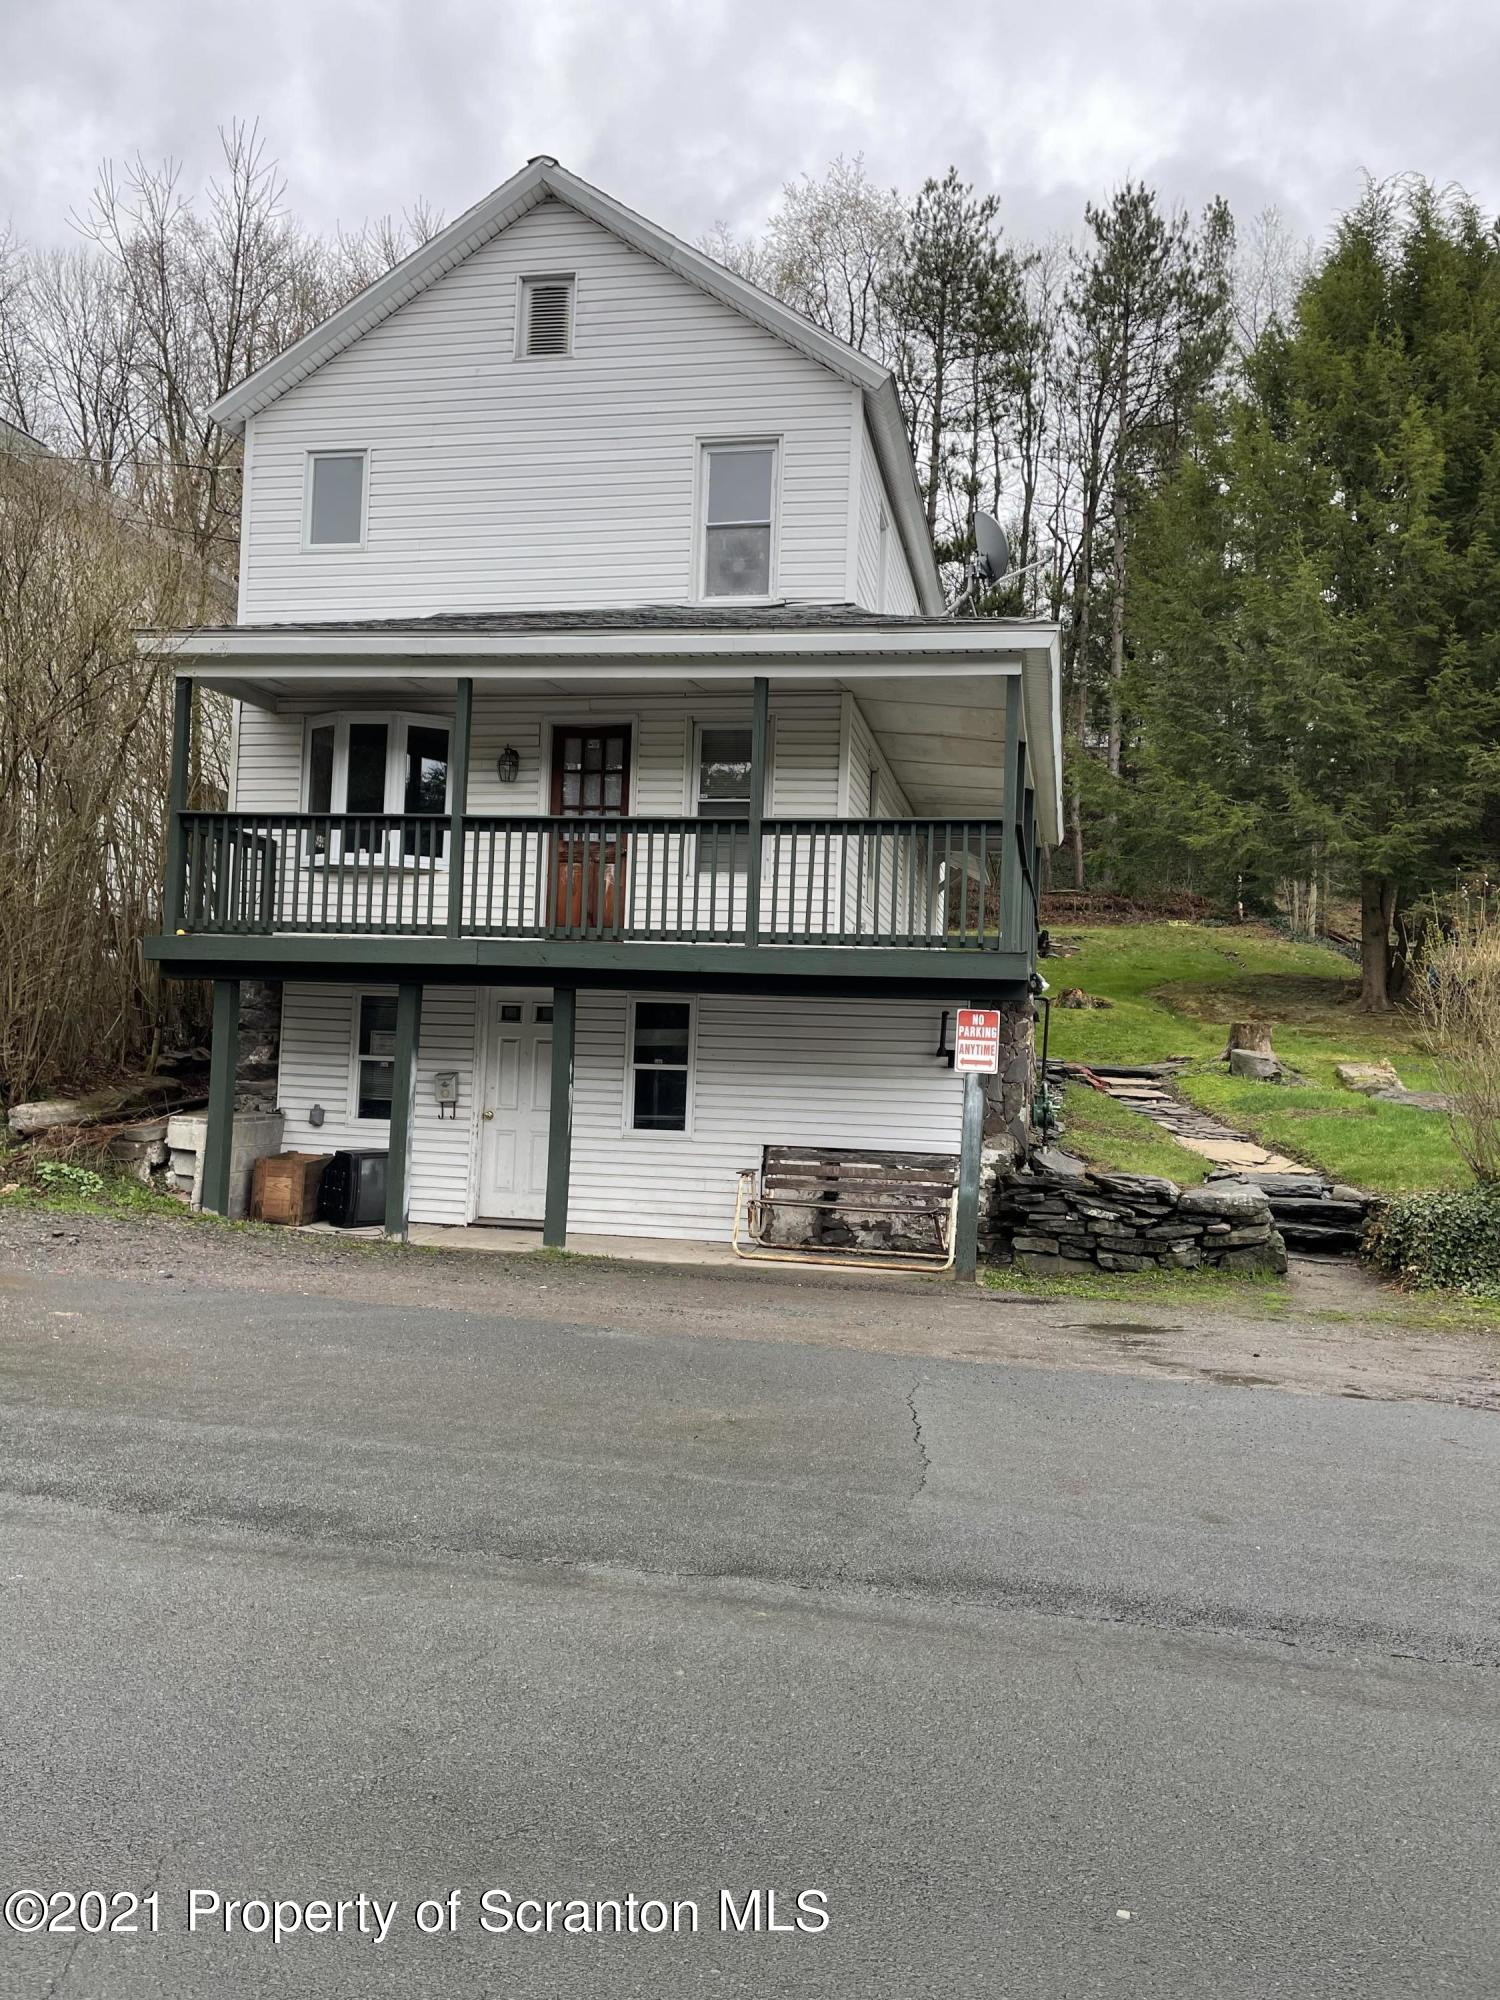 61 Ontario St, Simpson, Pennsylvania 18407, 3 Bedrooms Bedrooms, 5 Rooms Rooms,2 BathroomsBathrooms,Single Family,For Sale,Ontario,21-1353